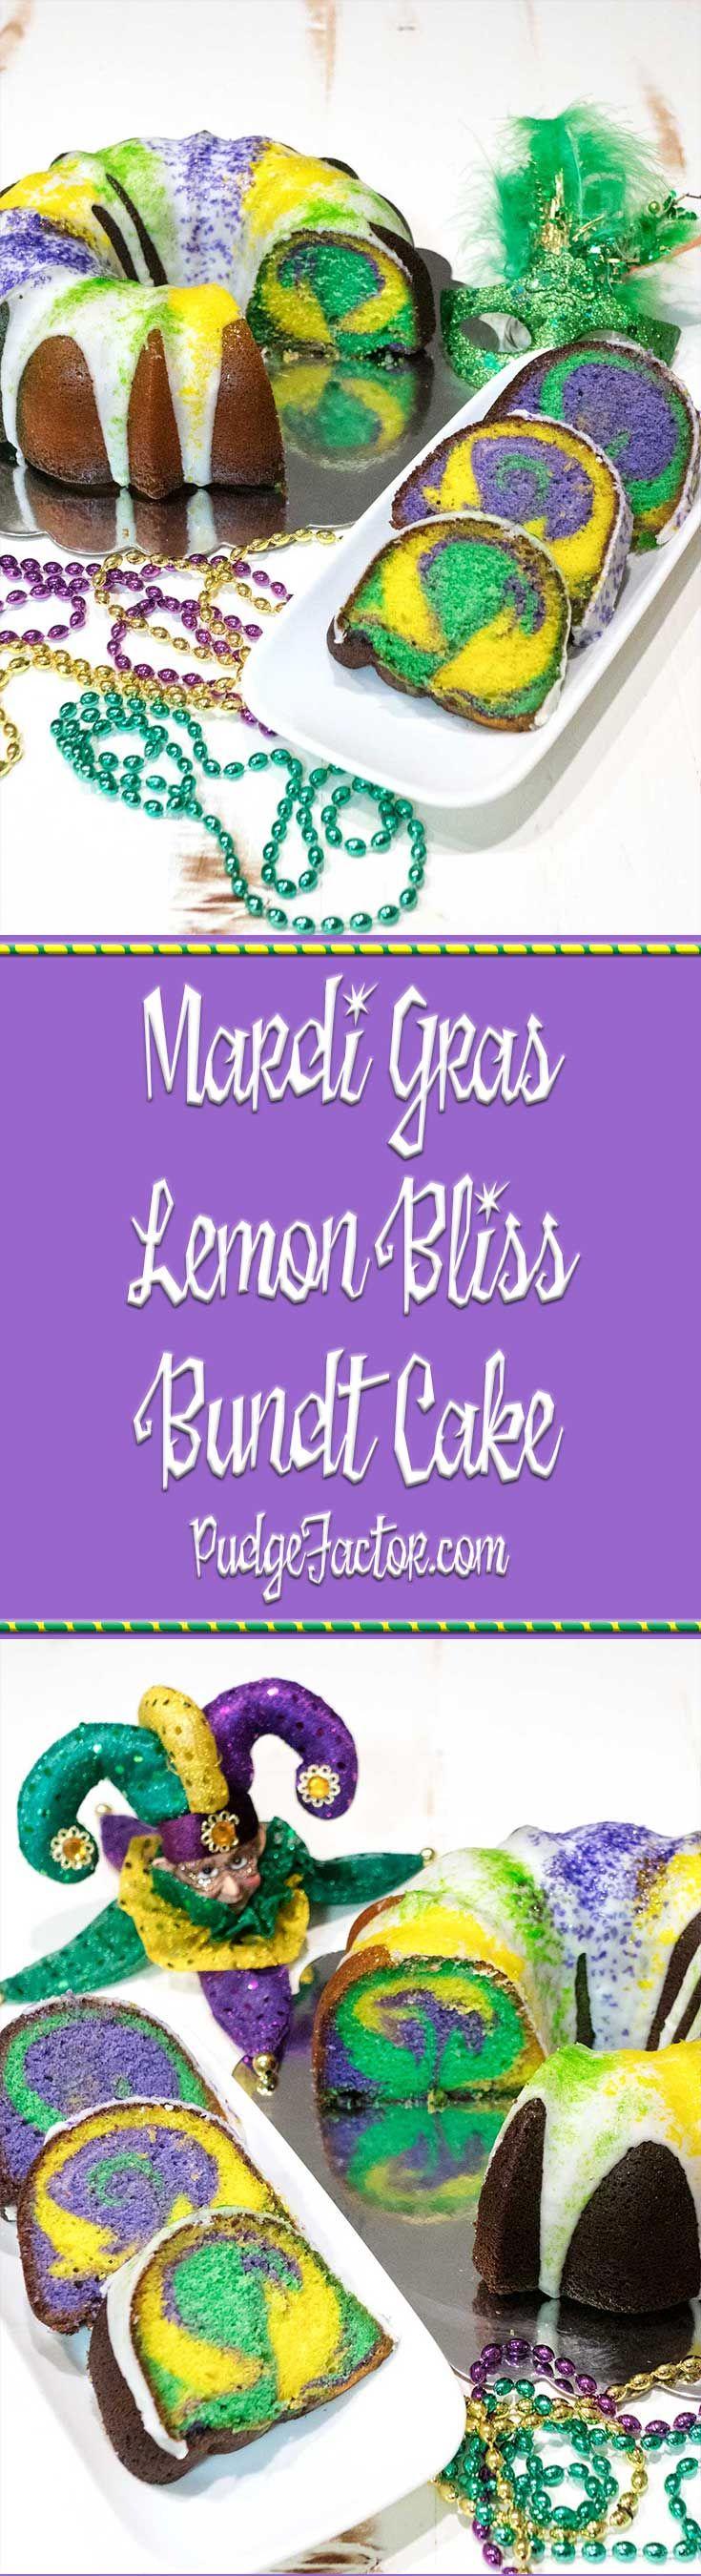 Brighten your Mardi Gras season with this rich and moist Lemon Bliss Bundt Cake. It tastes amazing under a layer of lemon glaze. via @c2king